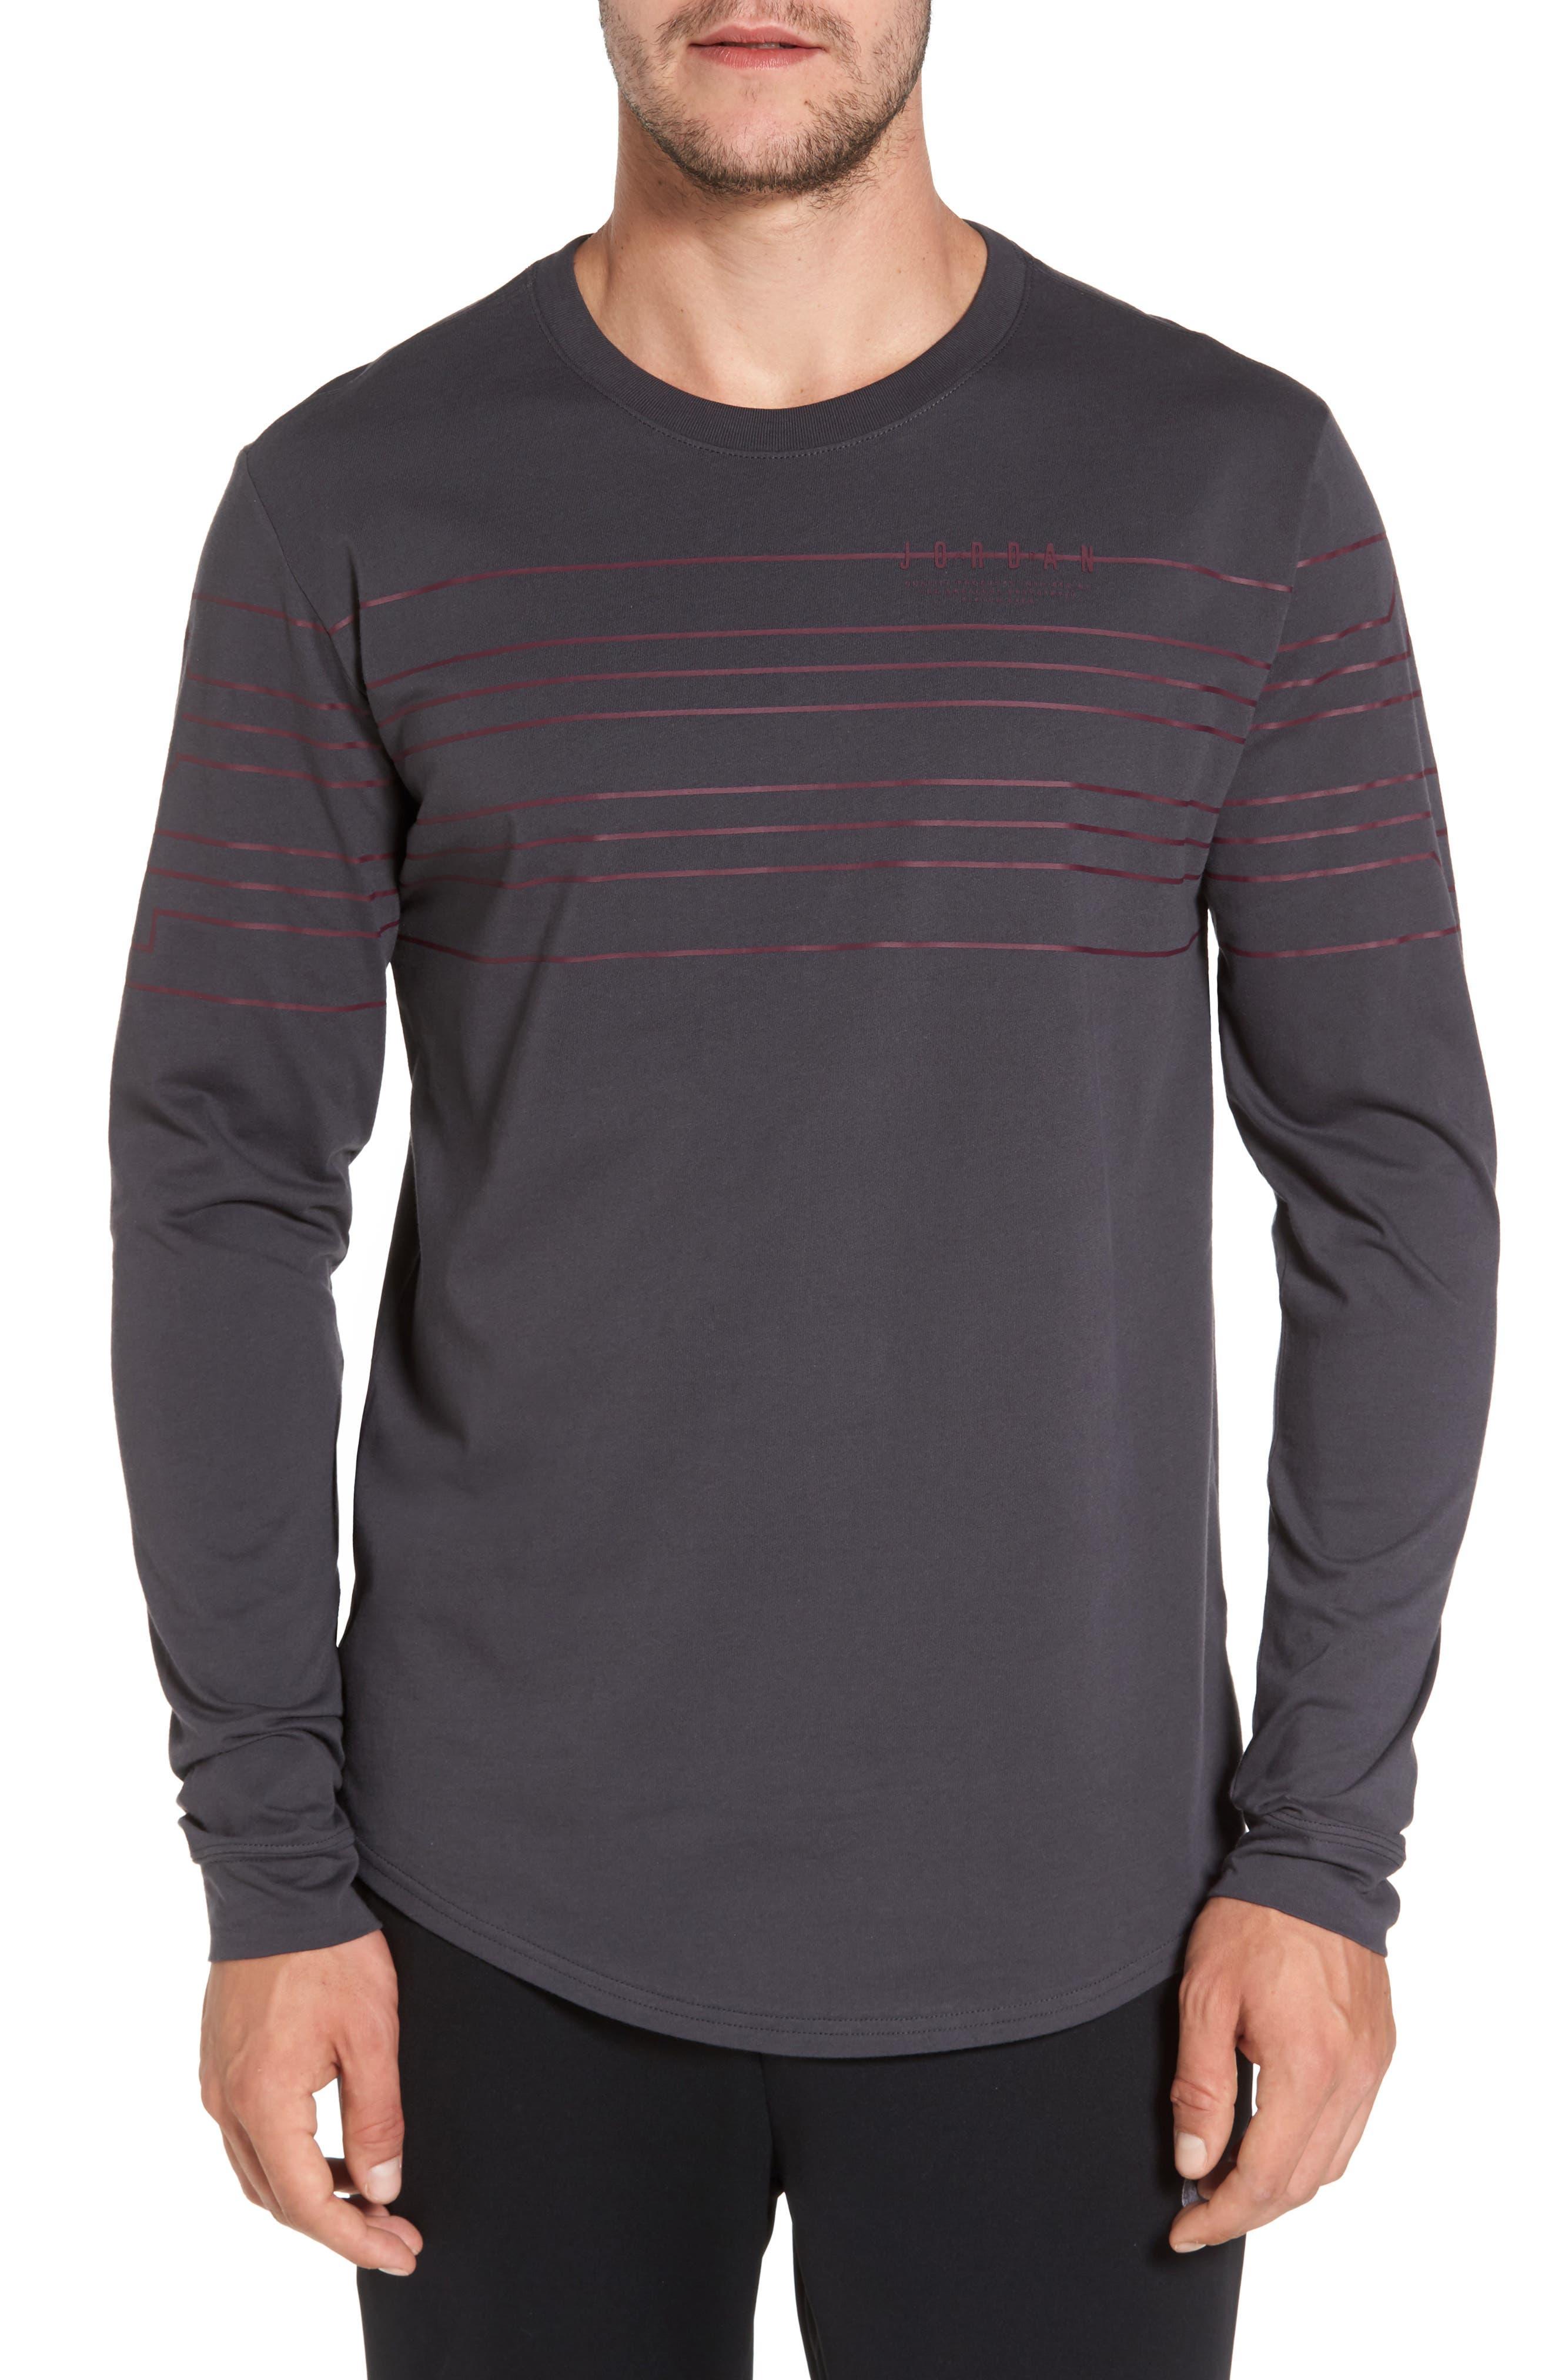 Sportswear 23 T-Shirt,                             Main thumbnail 1, color,